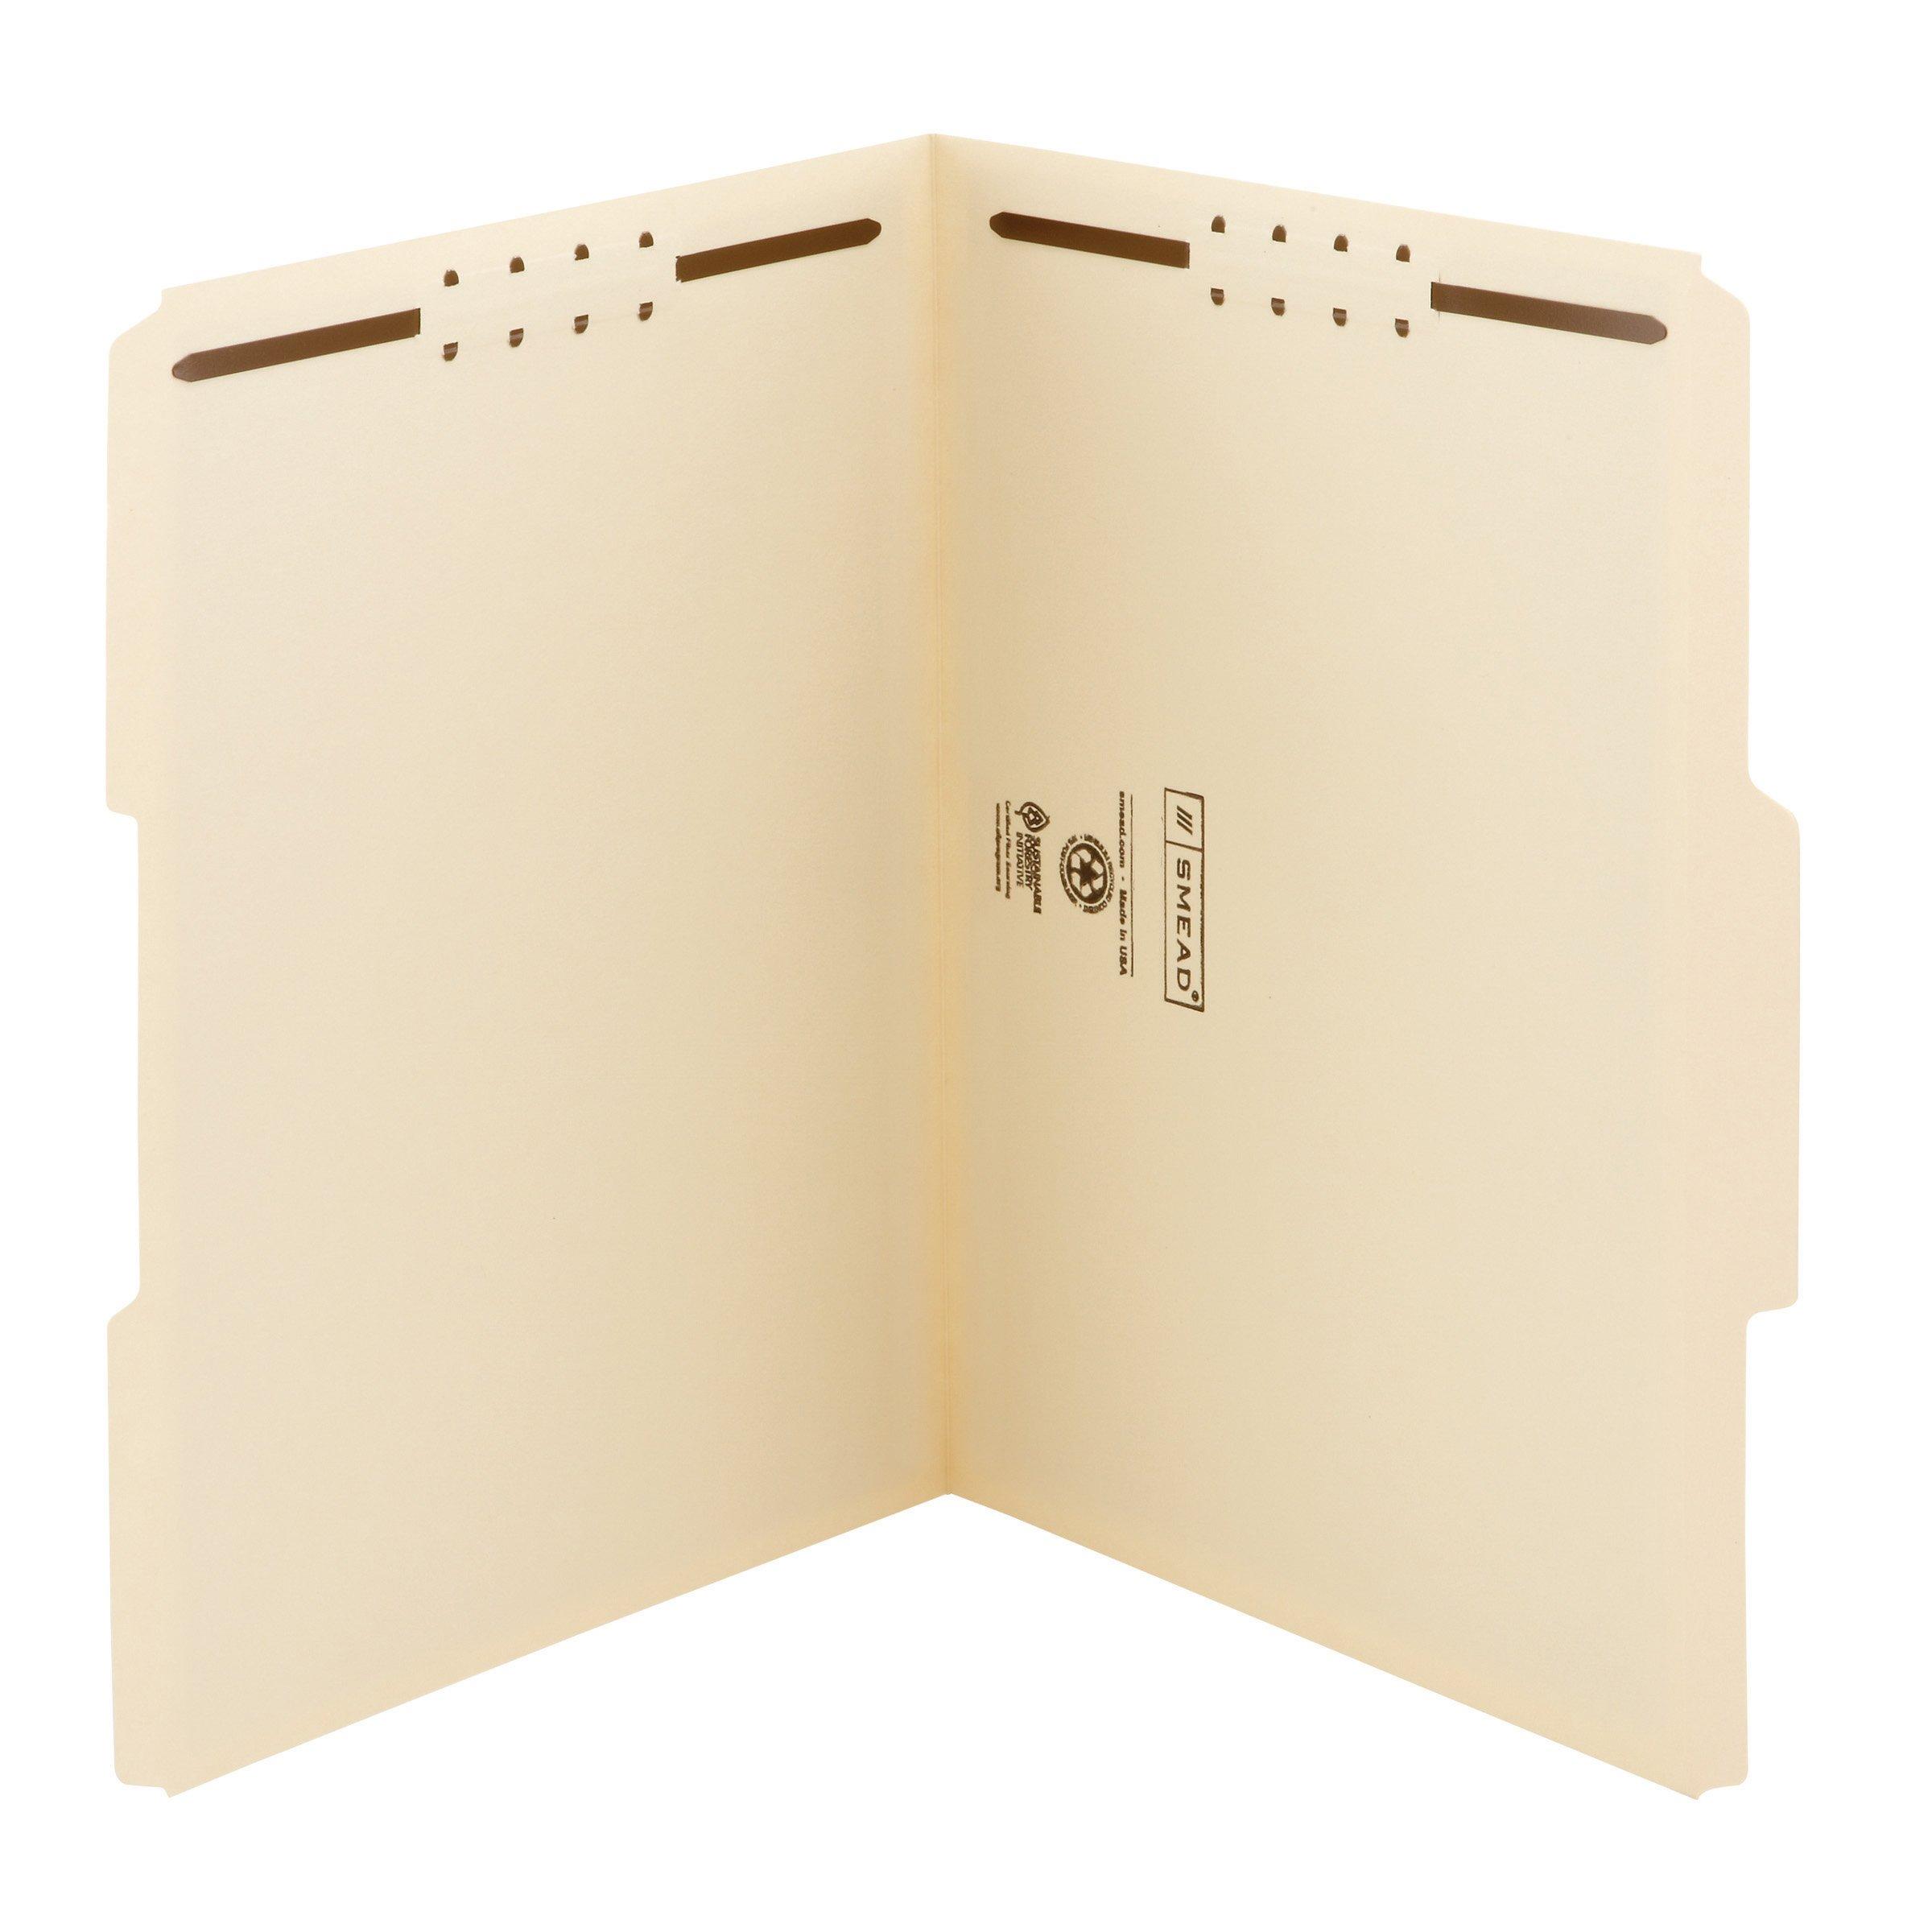 Smead Heavy-Duty Fastener File Folder, 2 Fasteners, 1/3-Cut Tab, Letter Size, Manila, 50 per Box (14600) by Smead